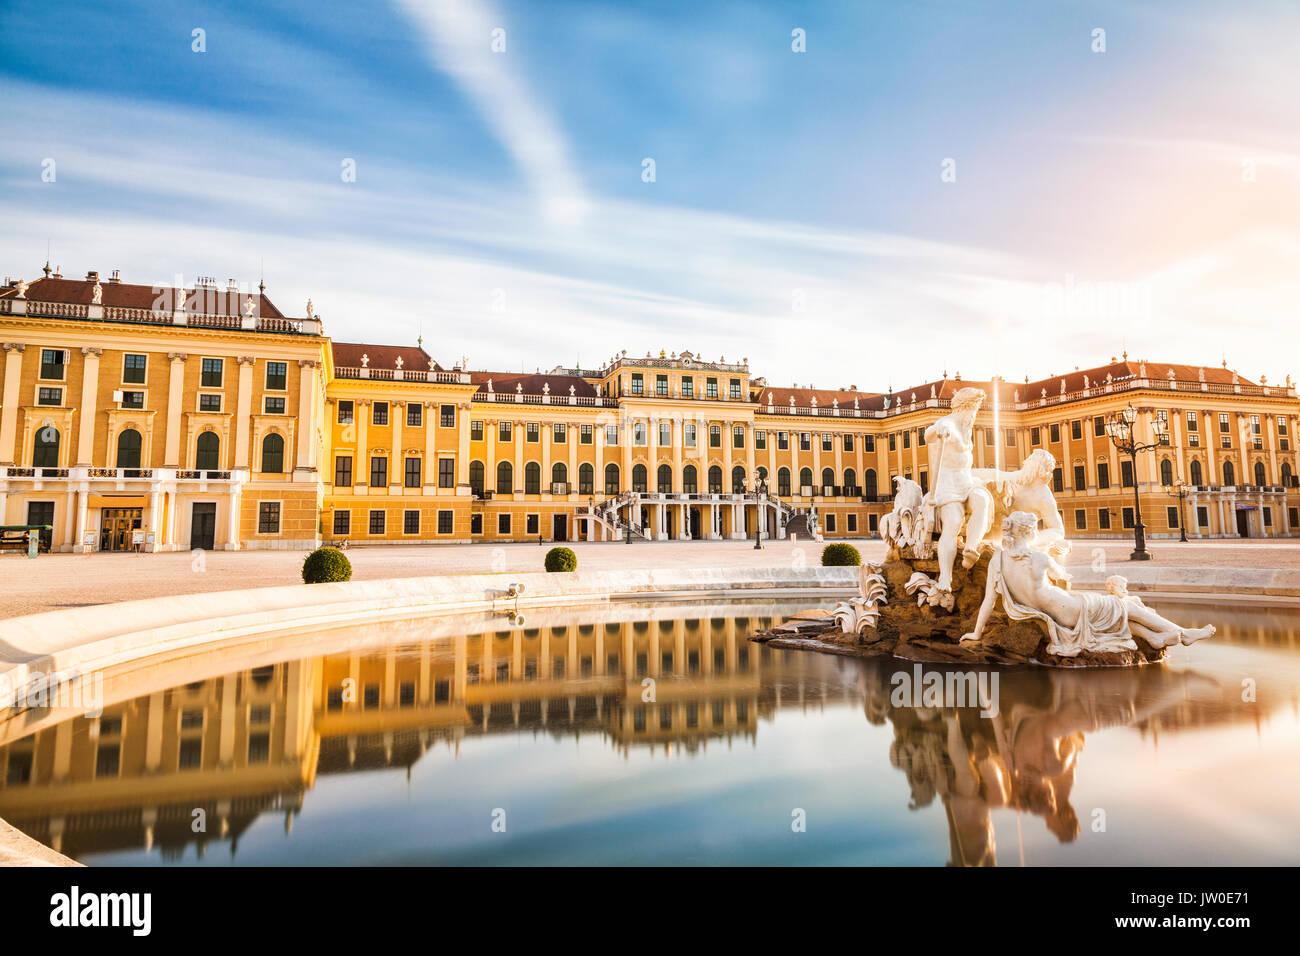 Beautiful Schonbrunn palace in Vienna, Austria - Stock Image